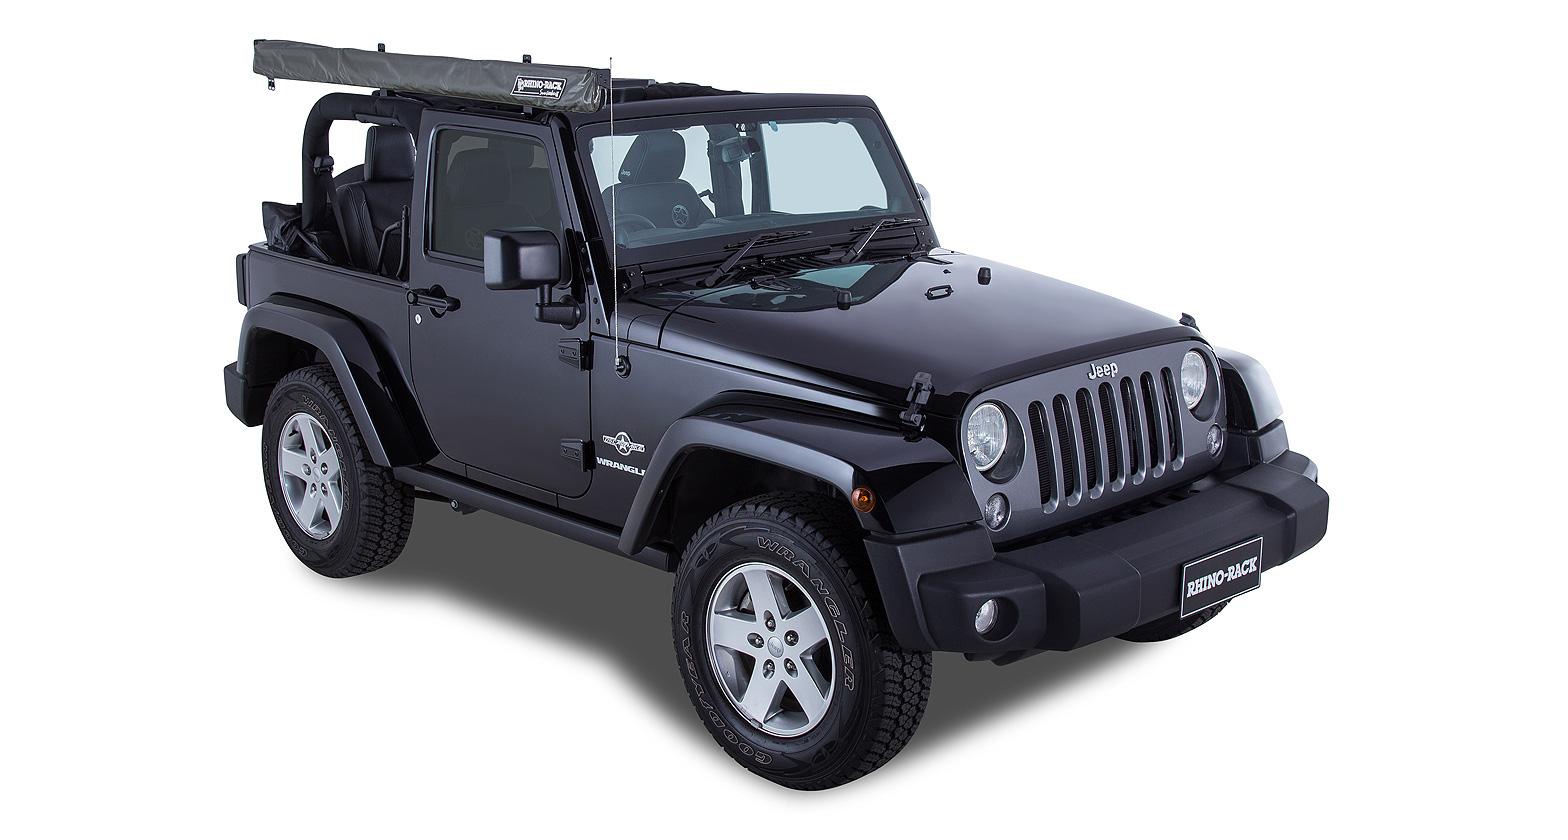 Sunseeker/Foxwing Eco cket Kit (Jeep Wrangler 2dr) - #32122 ...